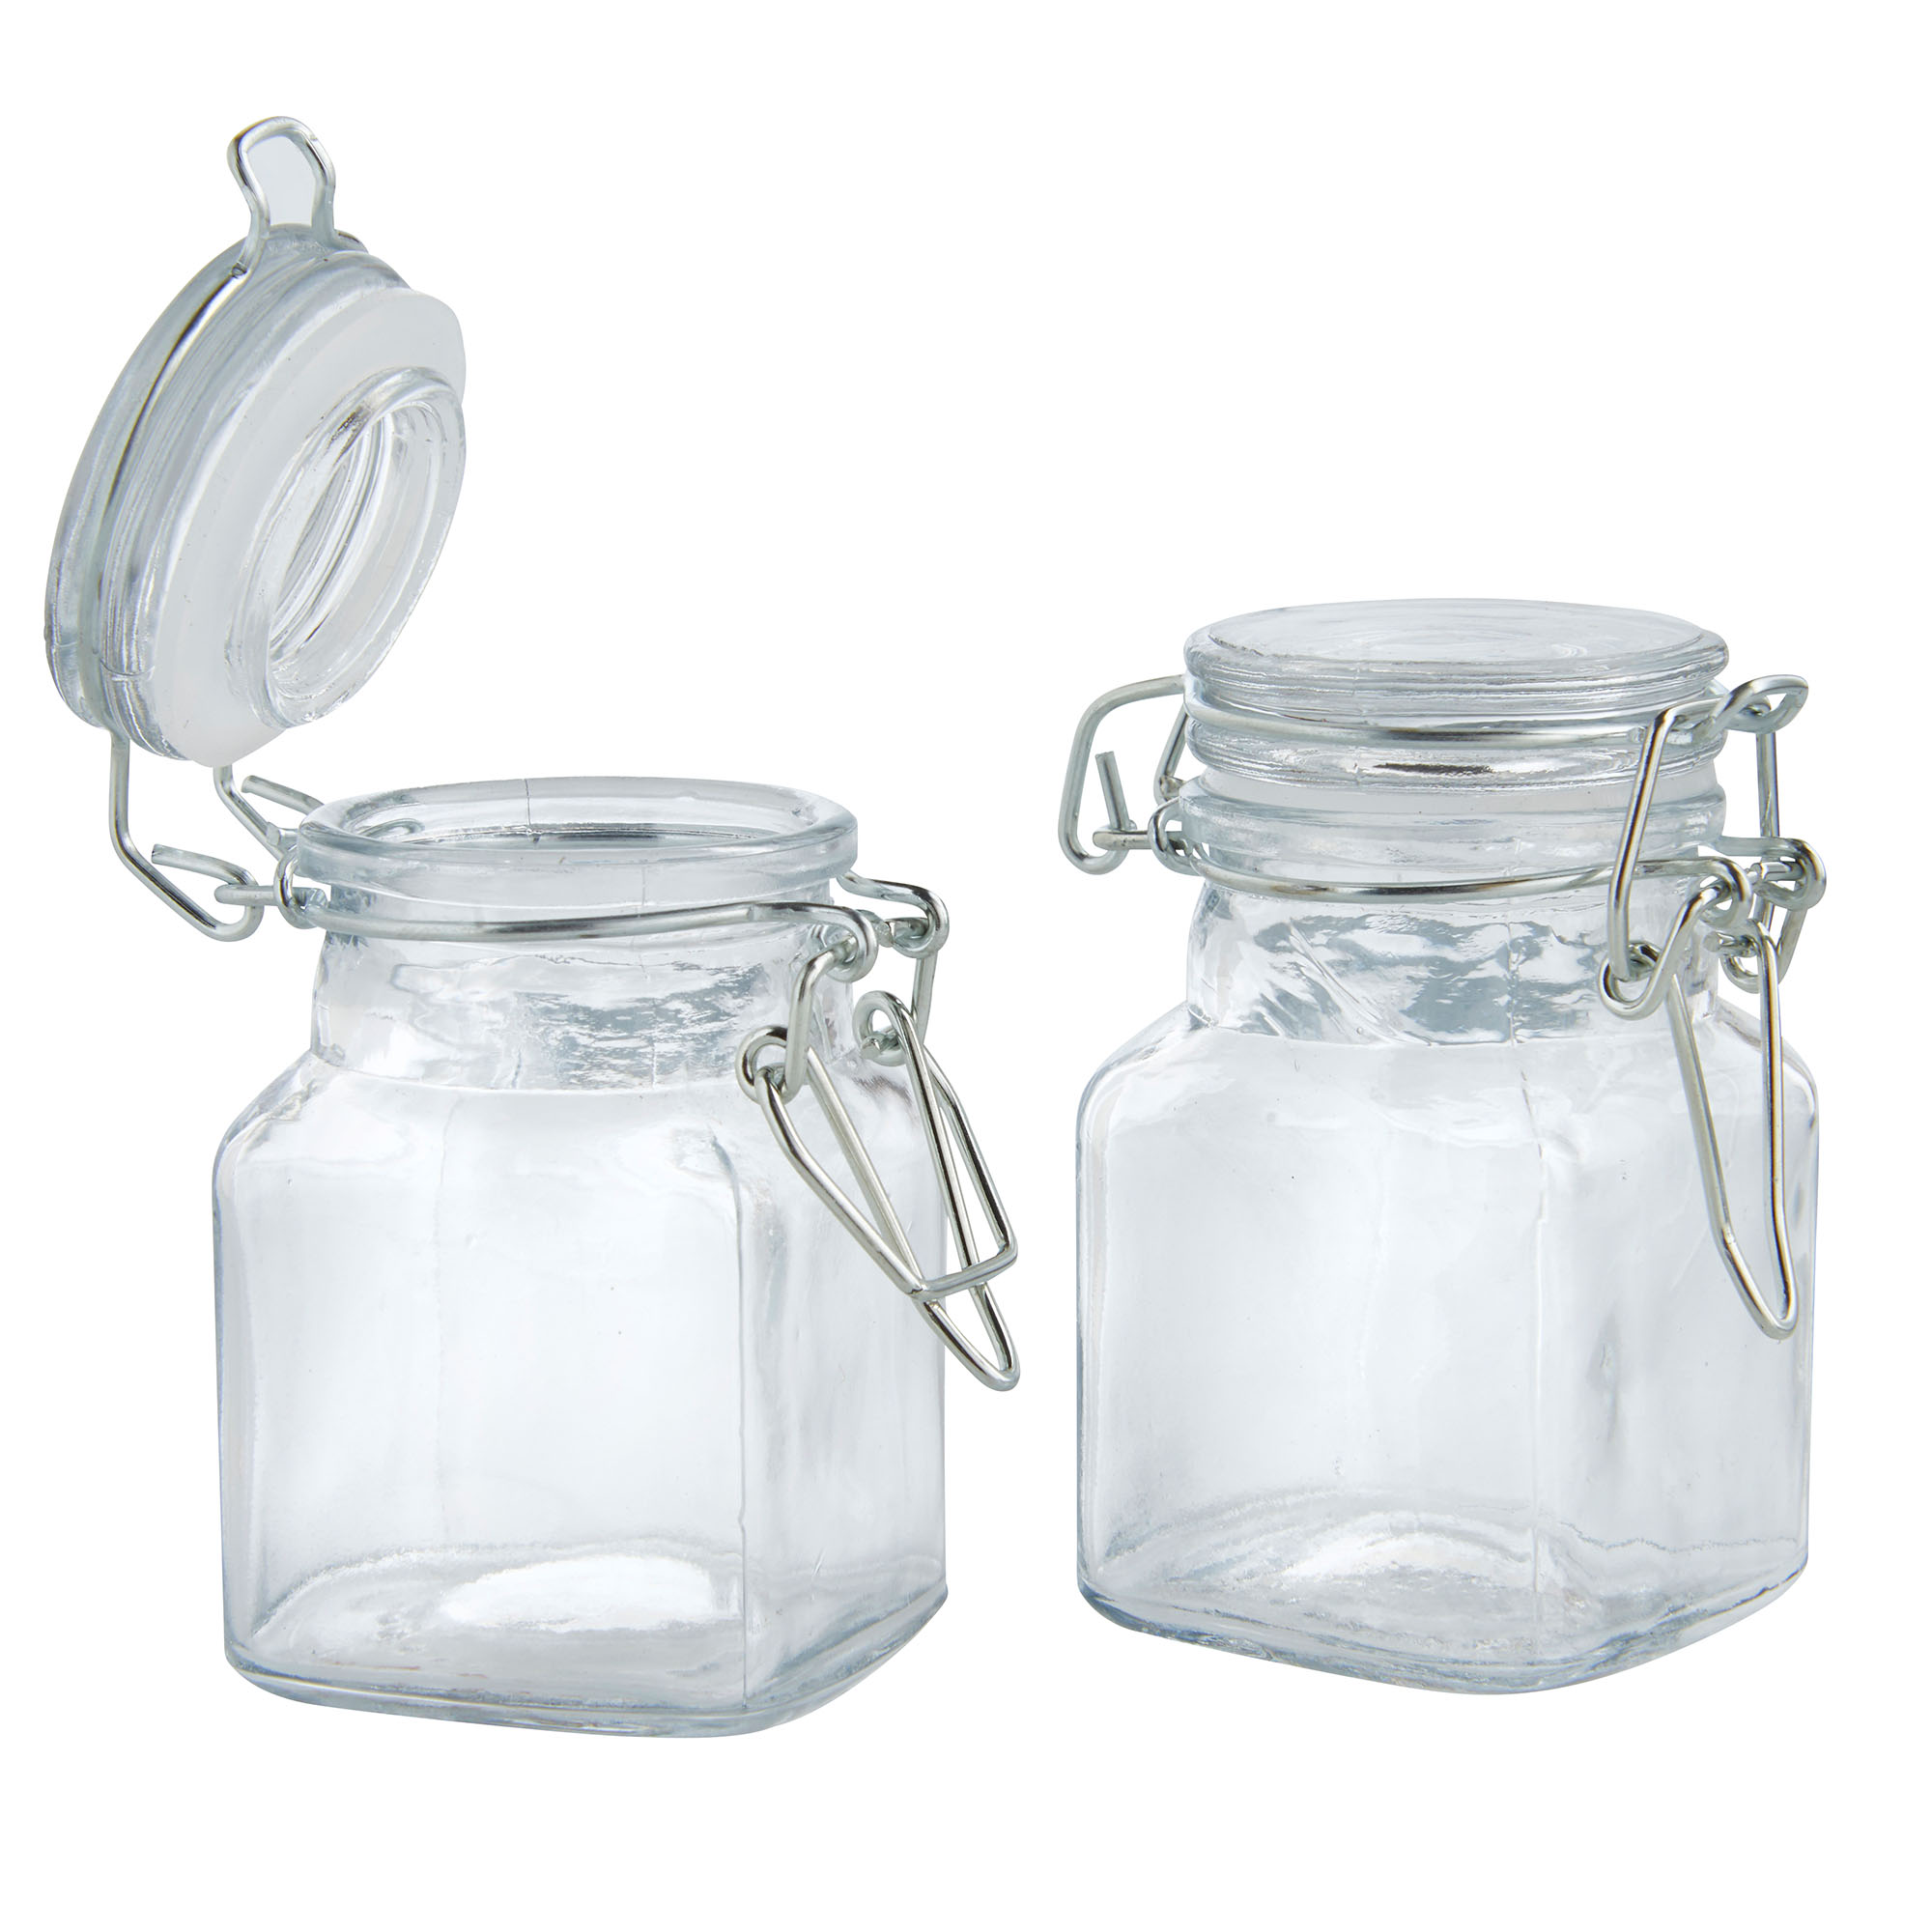 Airtight Clip Top Preserve Glass Jars